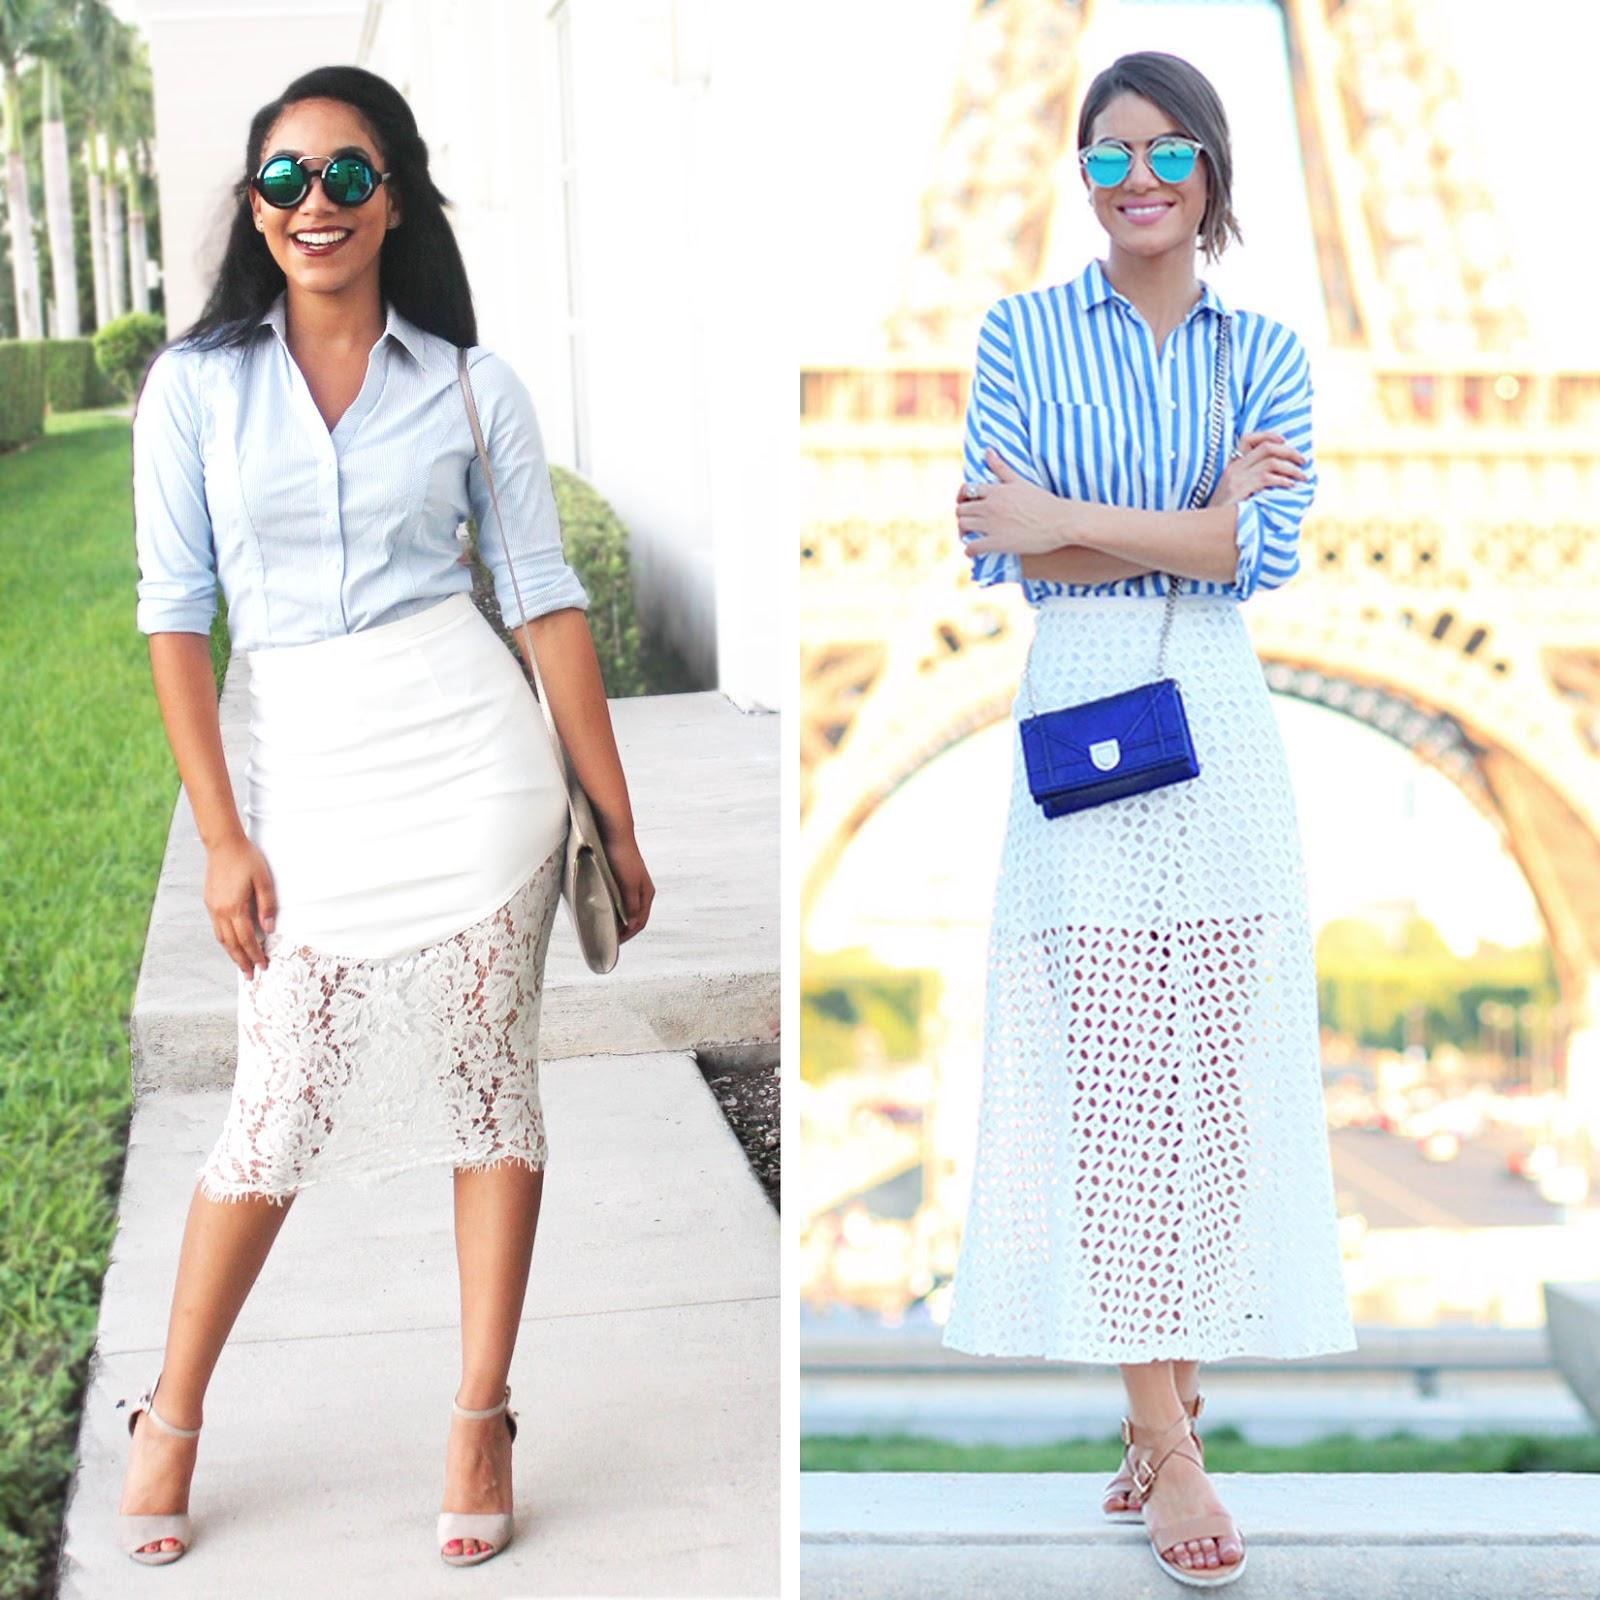 blogger-camila-coelho-outfit-white-skirt